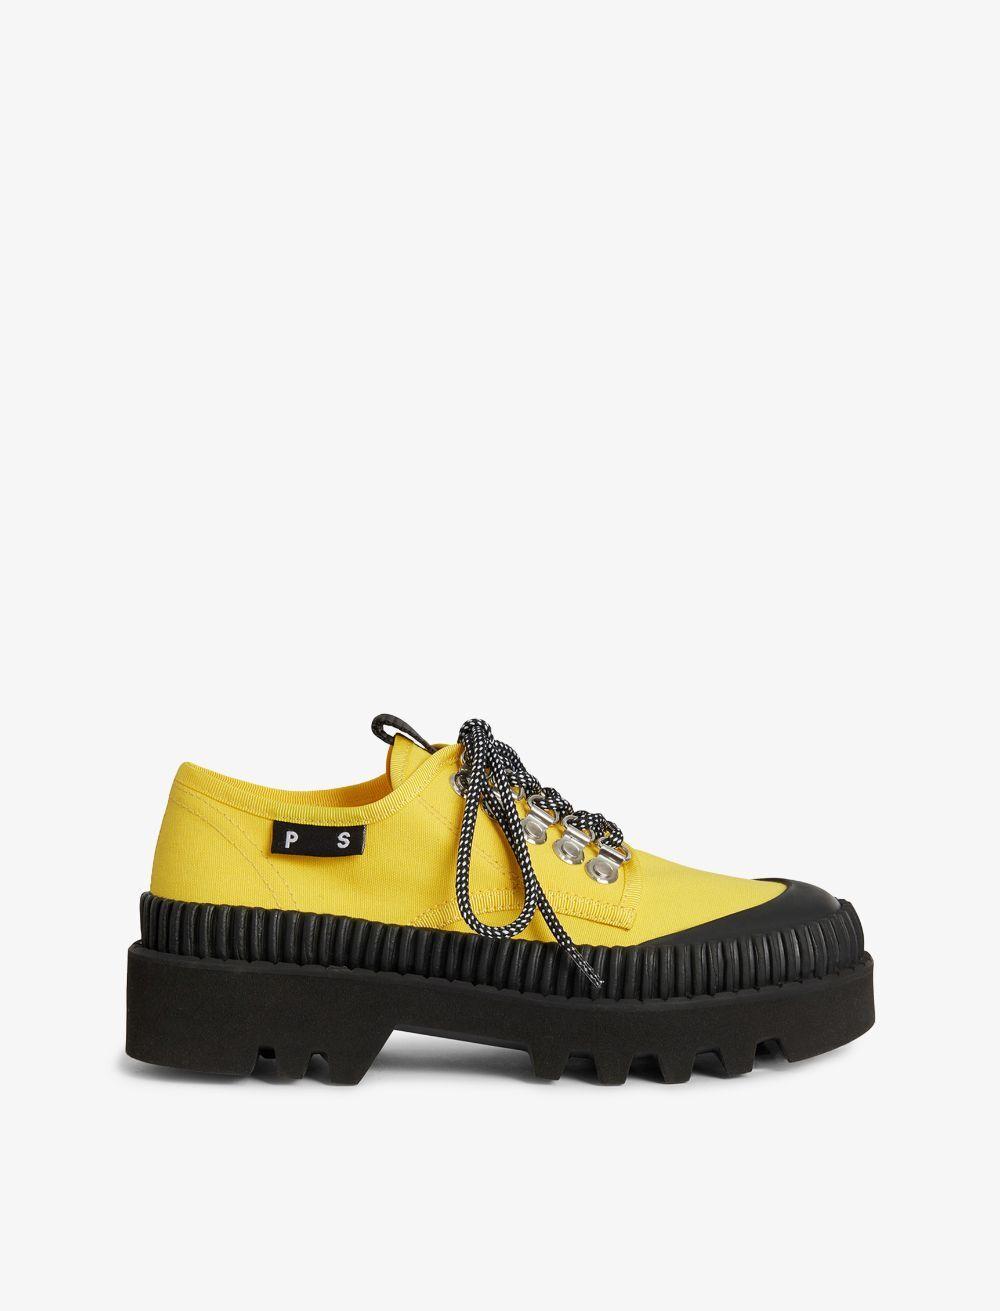 Proenza Schouler City Lug Sole Shoes 206 yellow 36